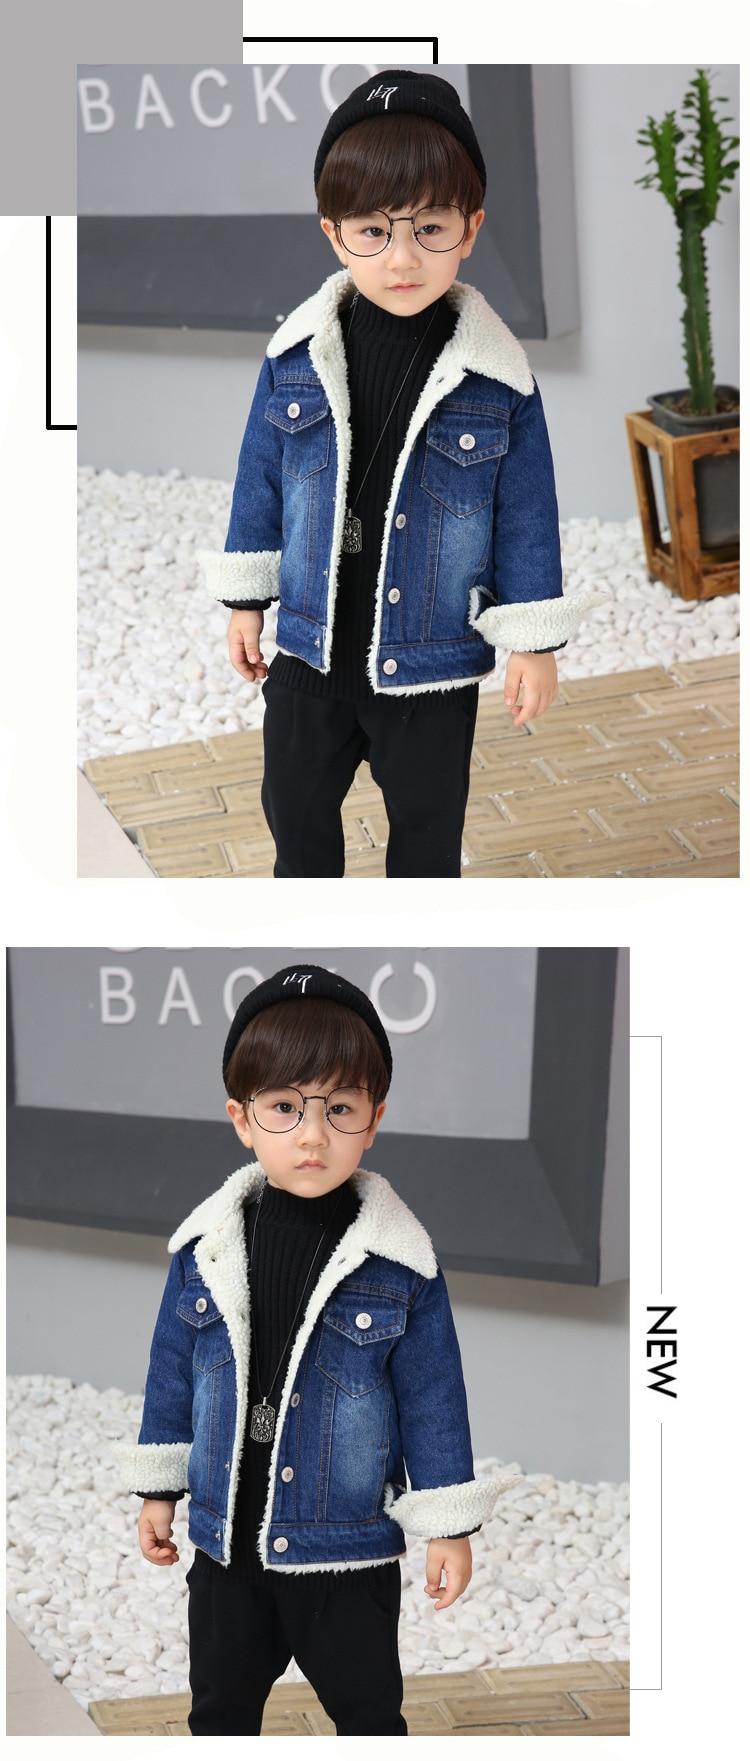 US $25.34 5% OFF|jean jackets for boy winter baby boys coat fake fur coat girls jackets denim baby clothing boys children roupas infantis menina in